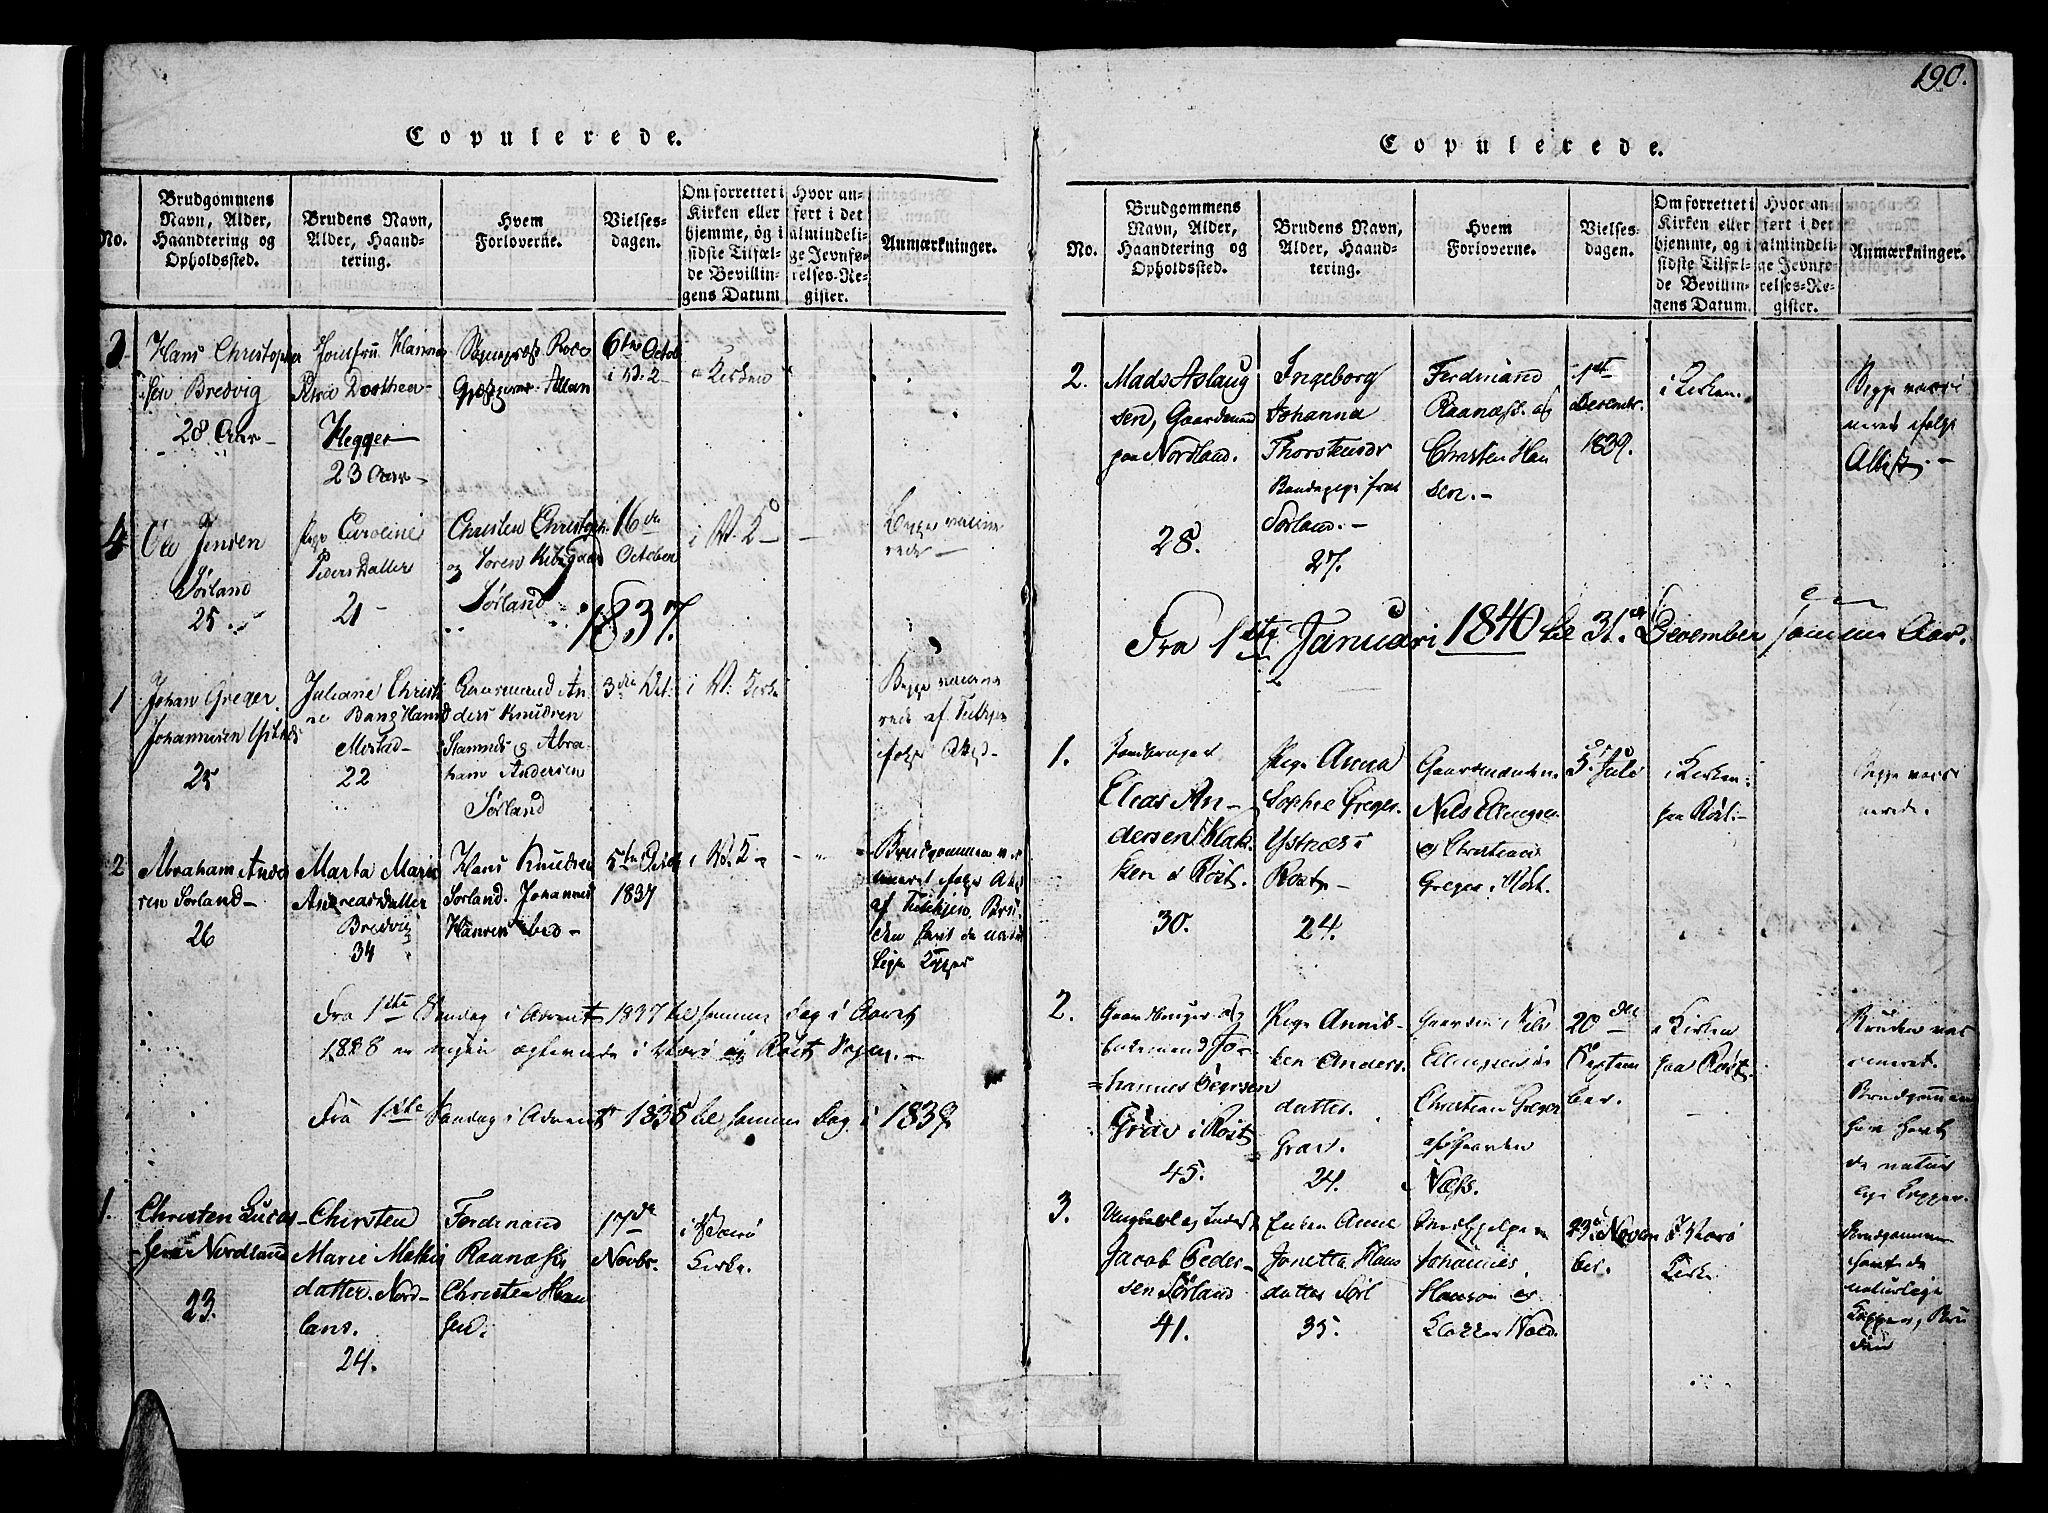 SAT, Ministerialprotokoller, klokkerbøker og fødselsregistre - Nordland, 807/L0120: Ministerialbok nr. 807A03, 1821-1848, s. 190